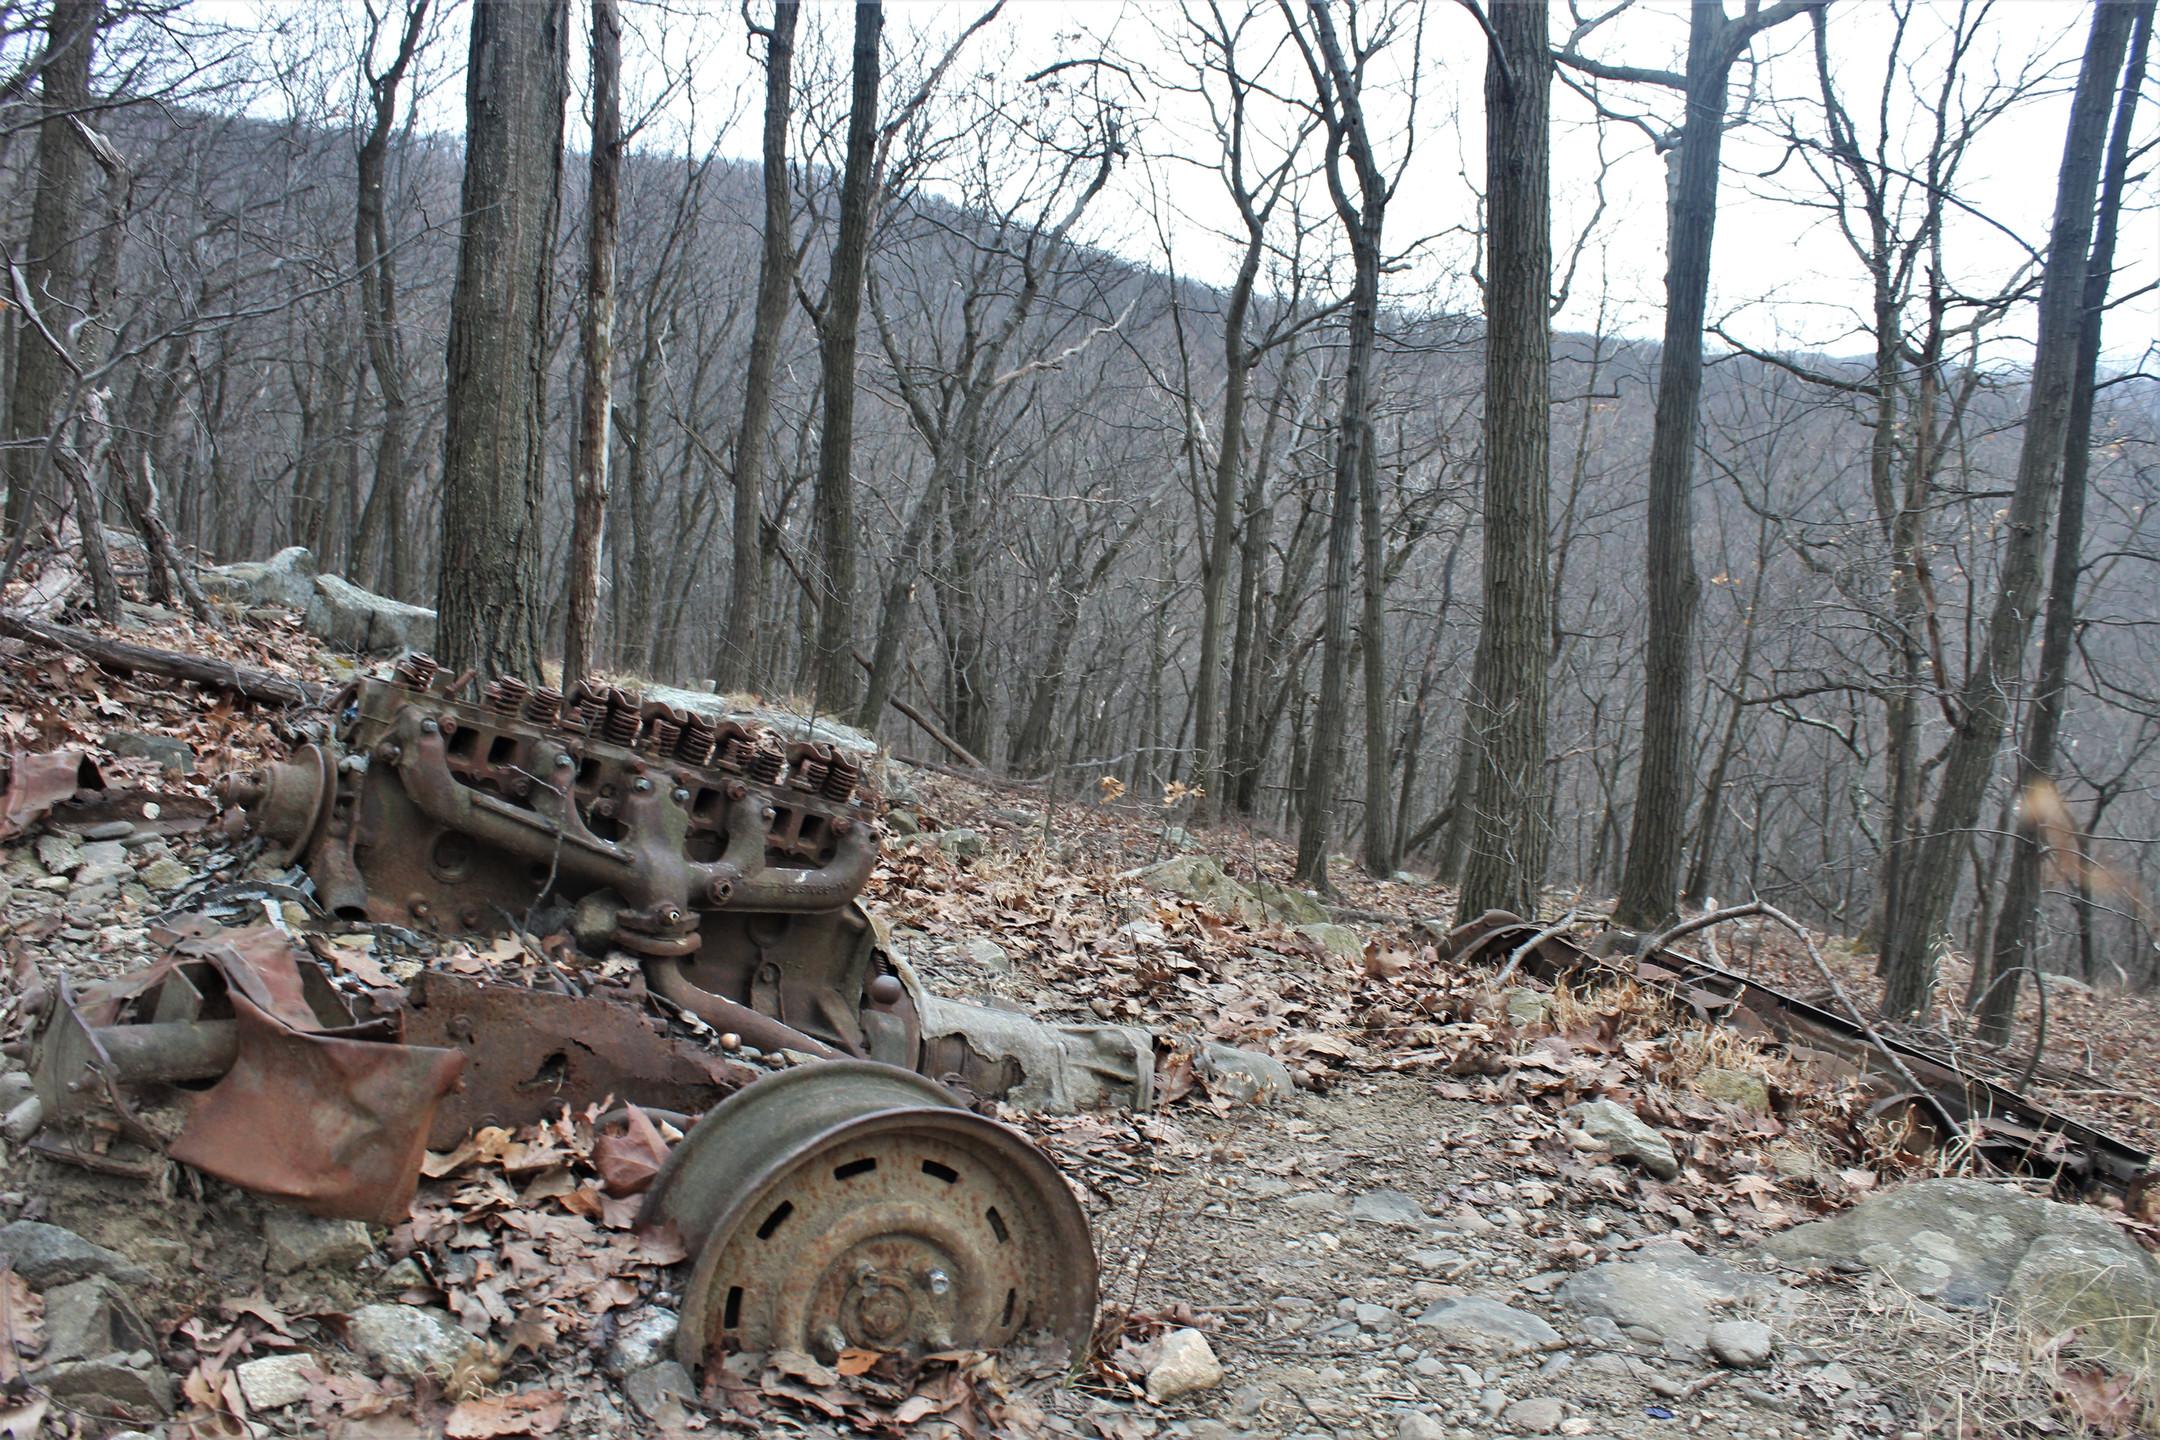 Rusting Car Parts Along Trail